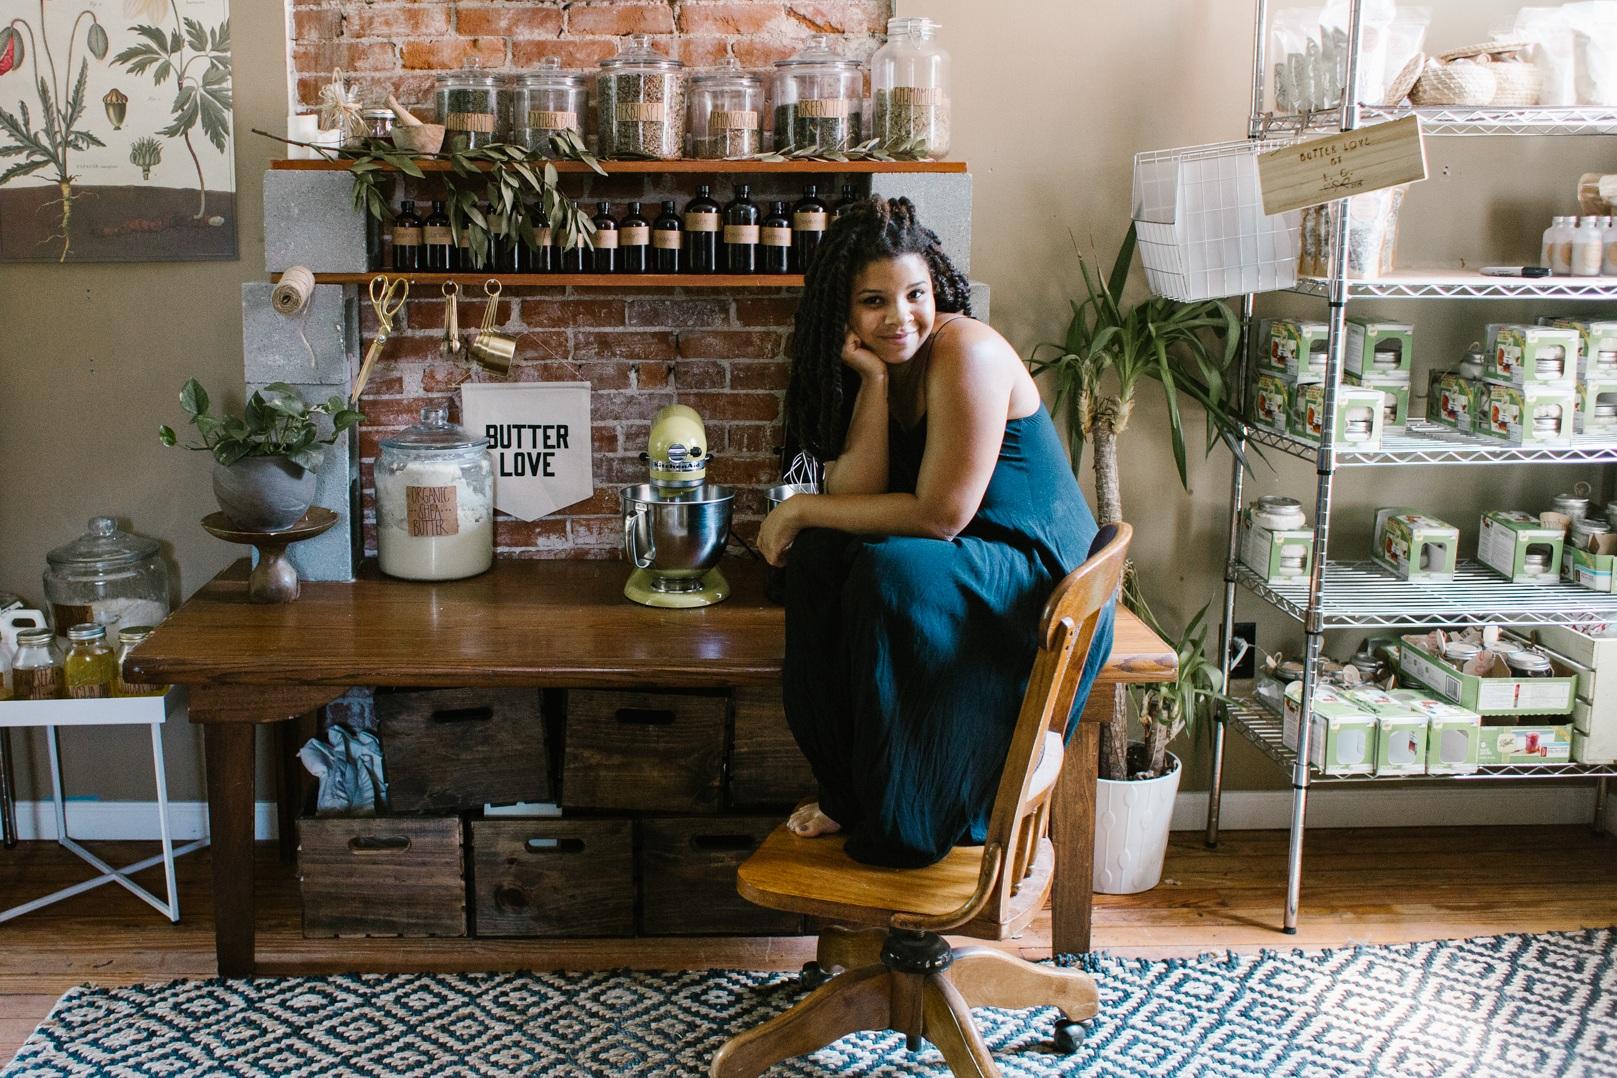 La'Crassia in her studio. Photo by Abby Gillardi.